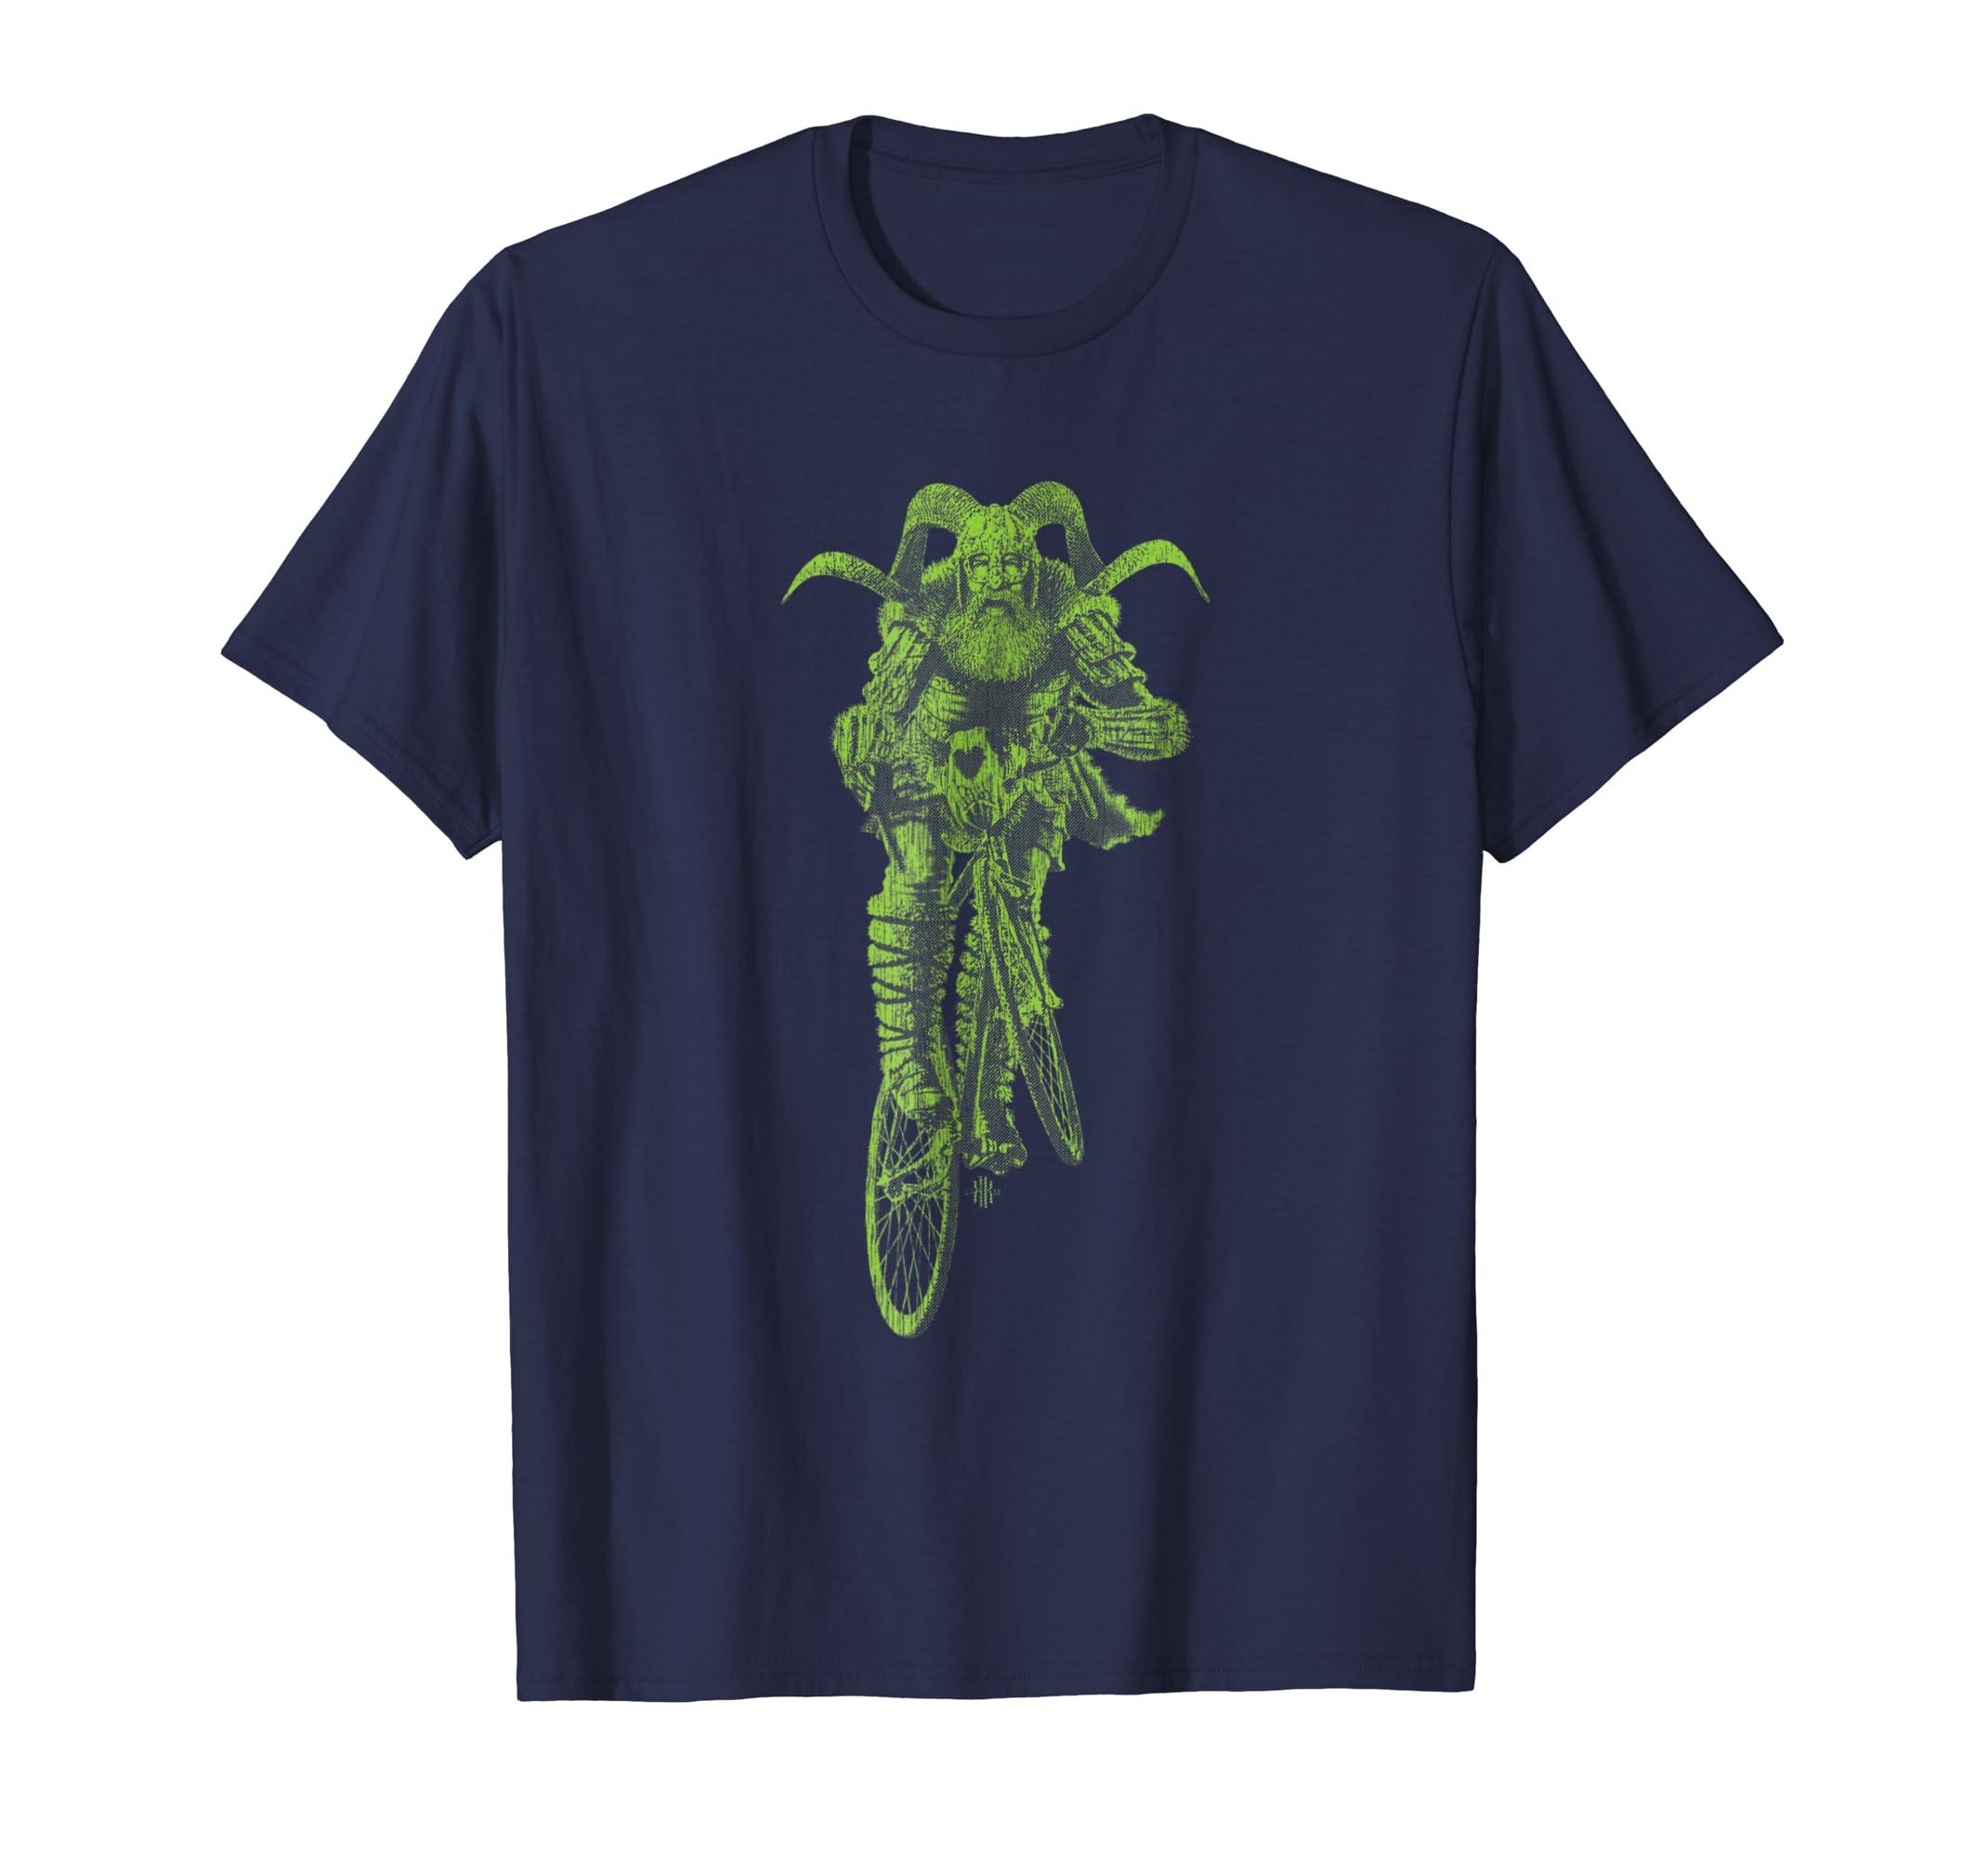 Viking Bicycle Club T Shirt: Epic Mountain Bike Design #07-azvn